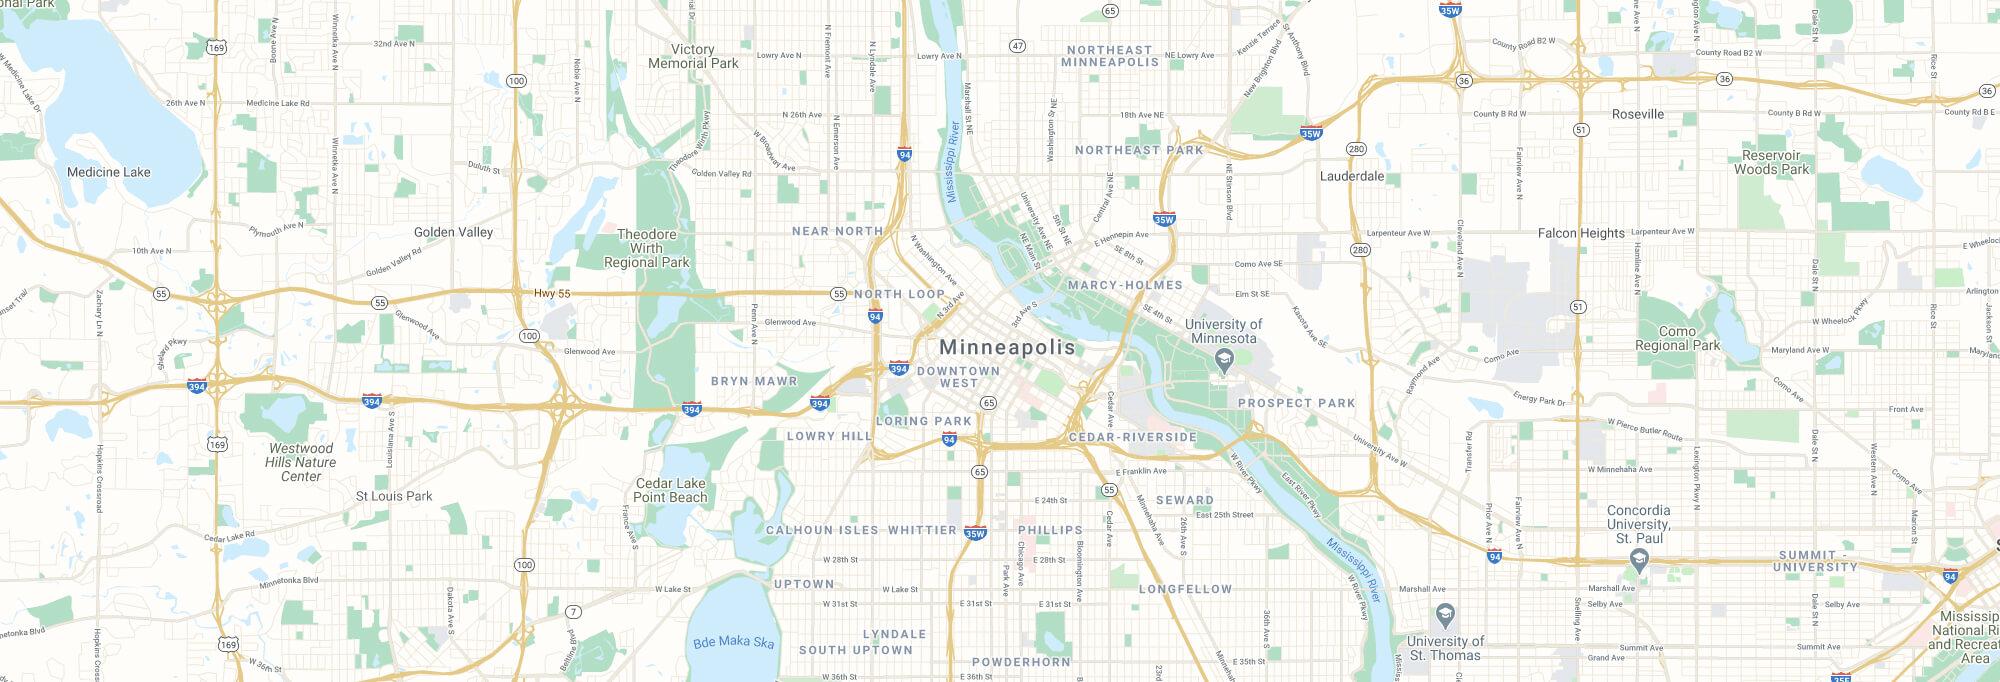 Minneapolis city map